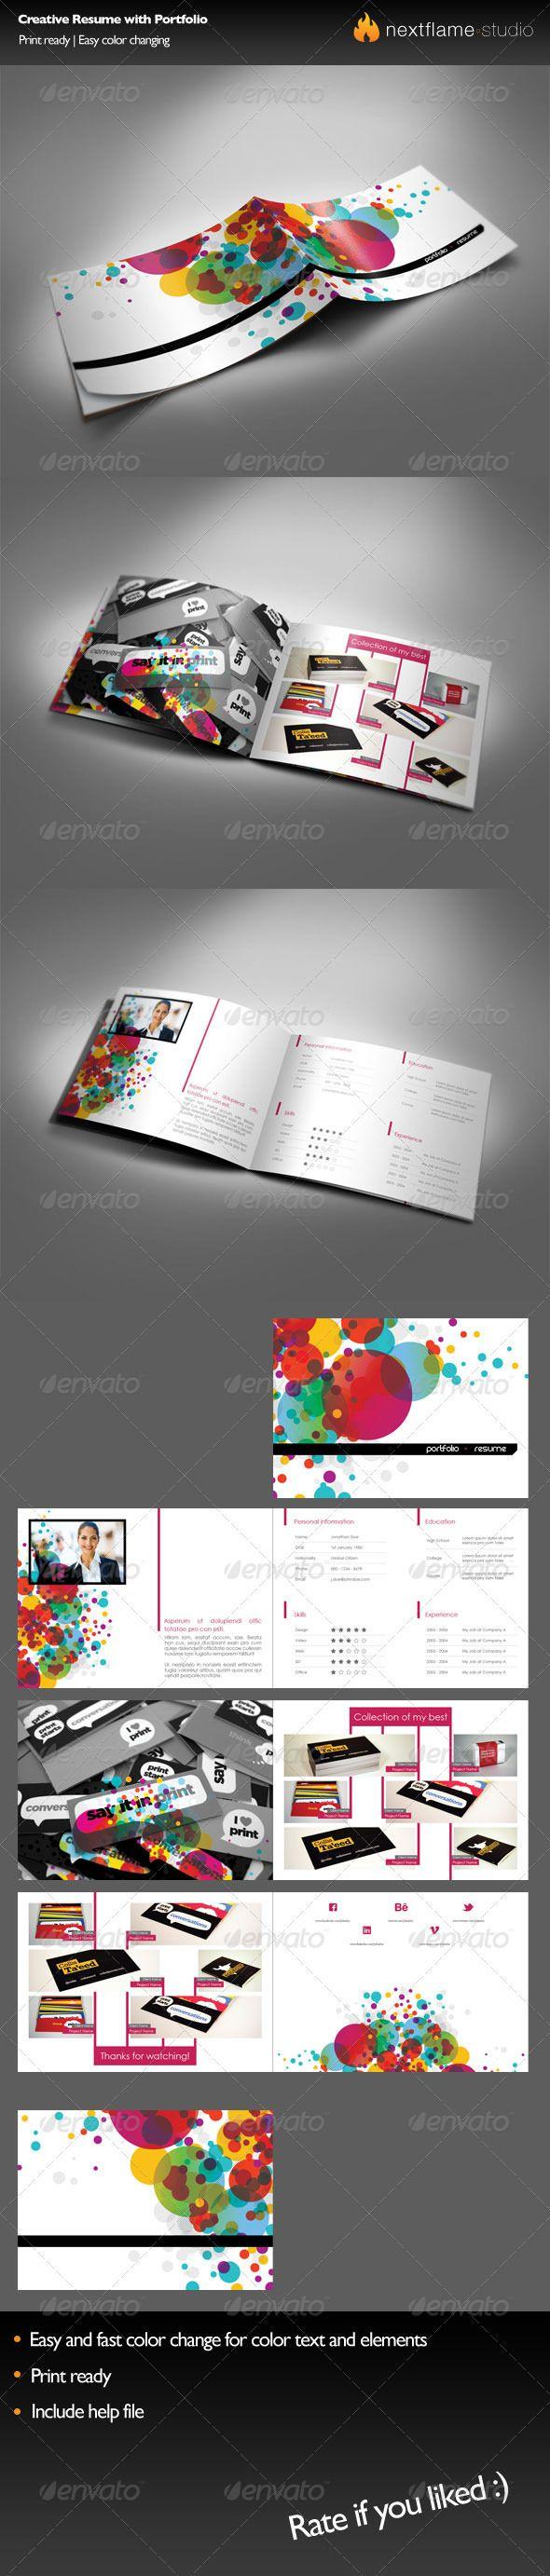 Creative Resume with Portfolio - Resume Template Indesign INDD ...